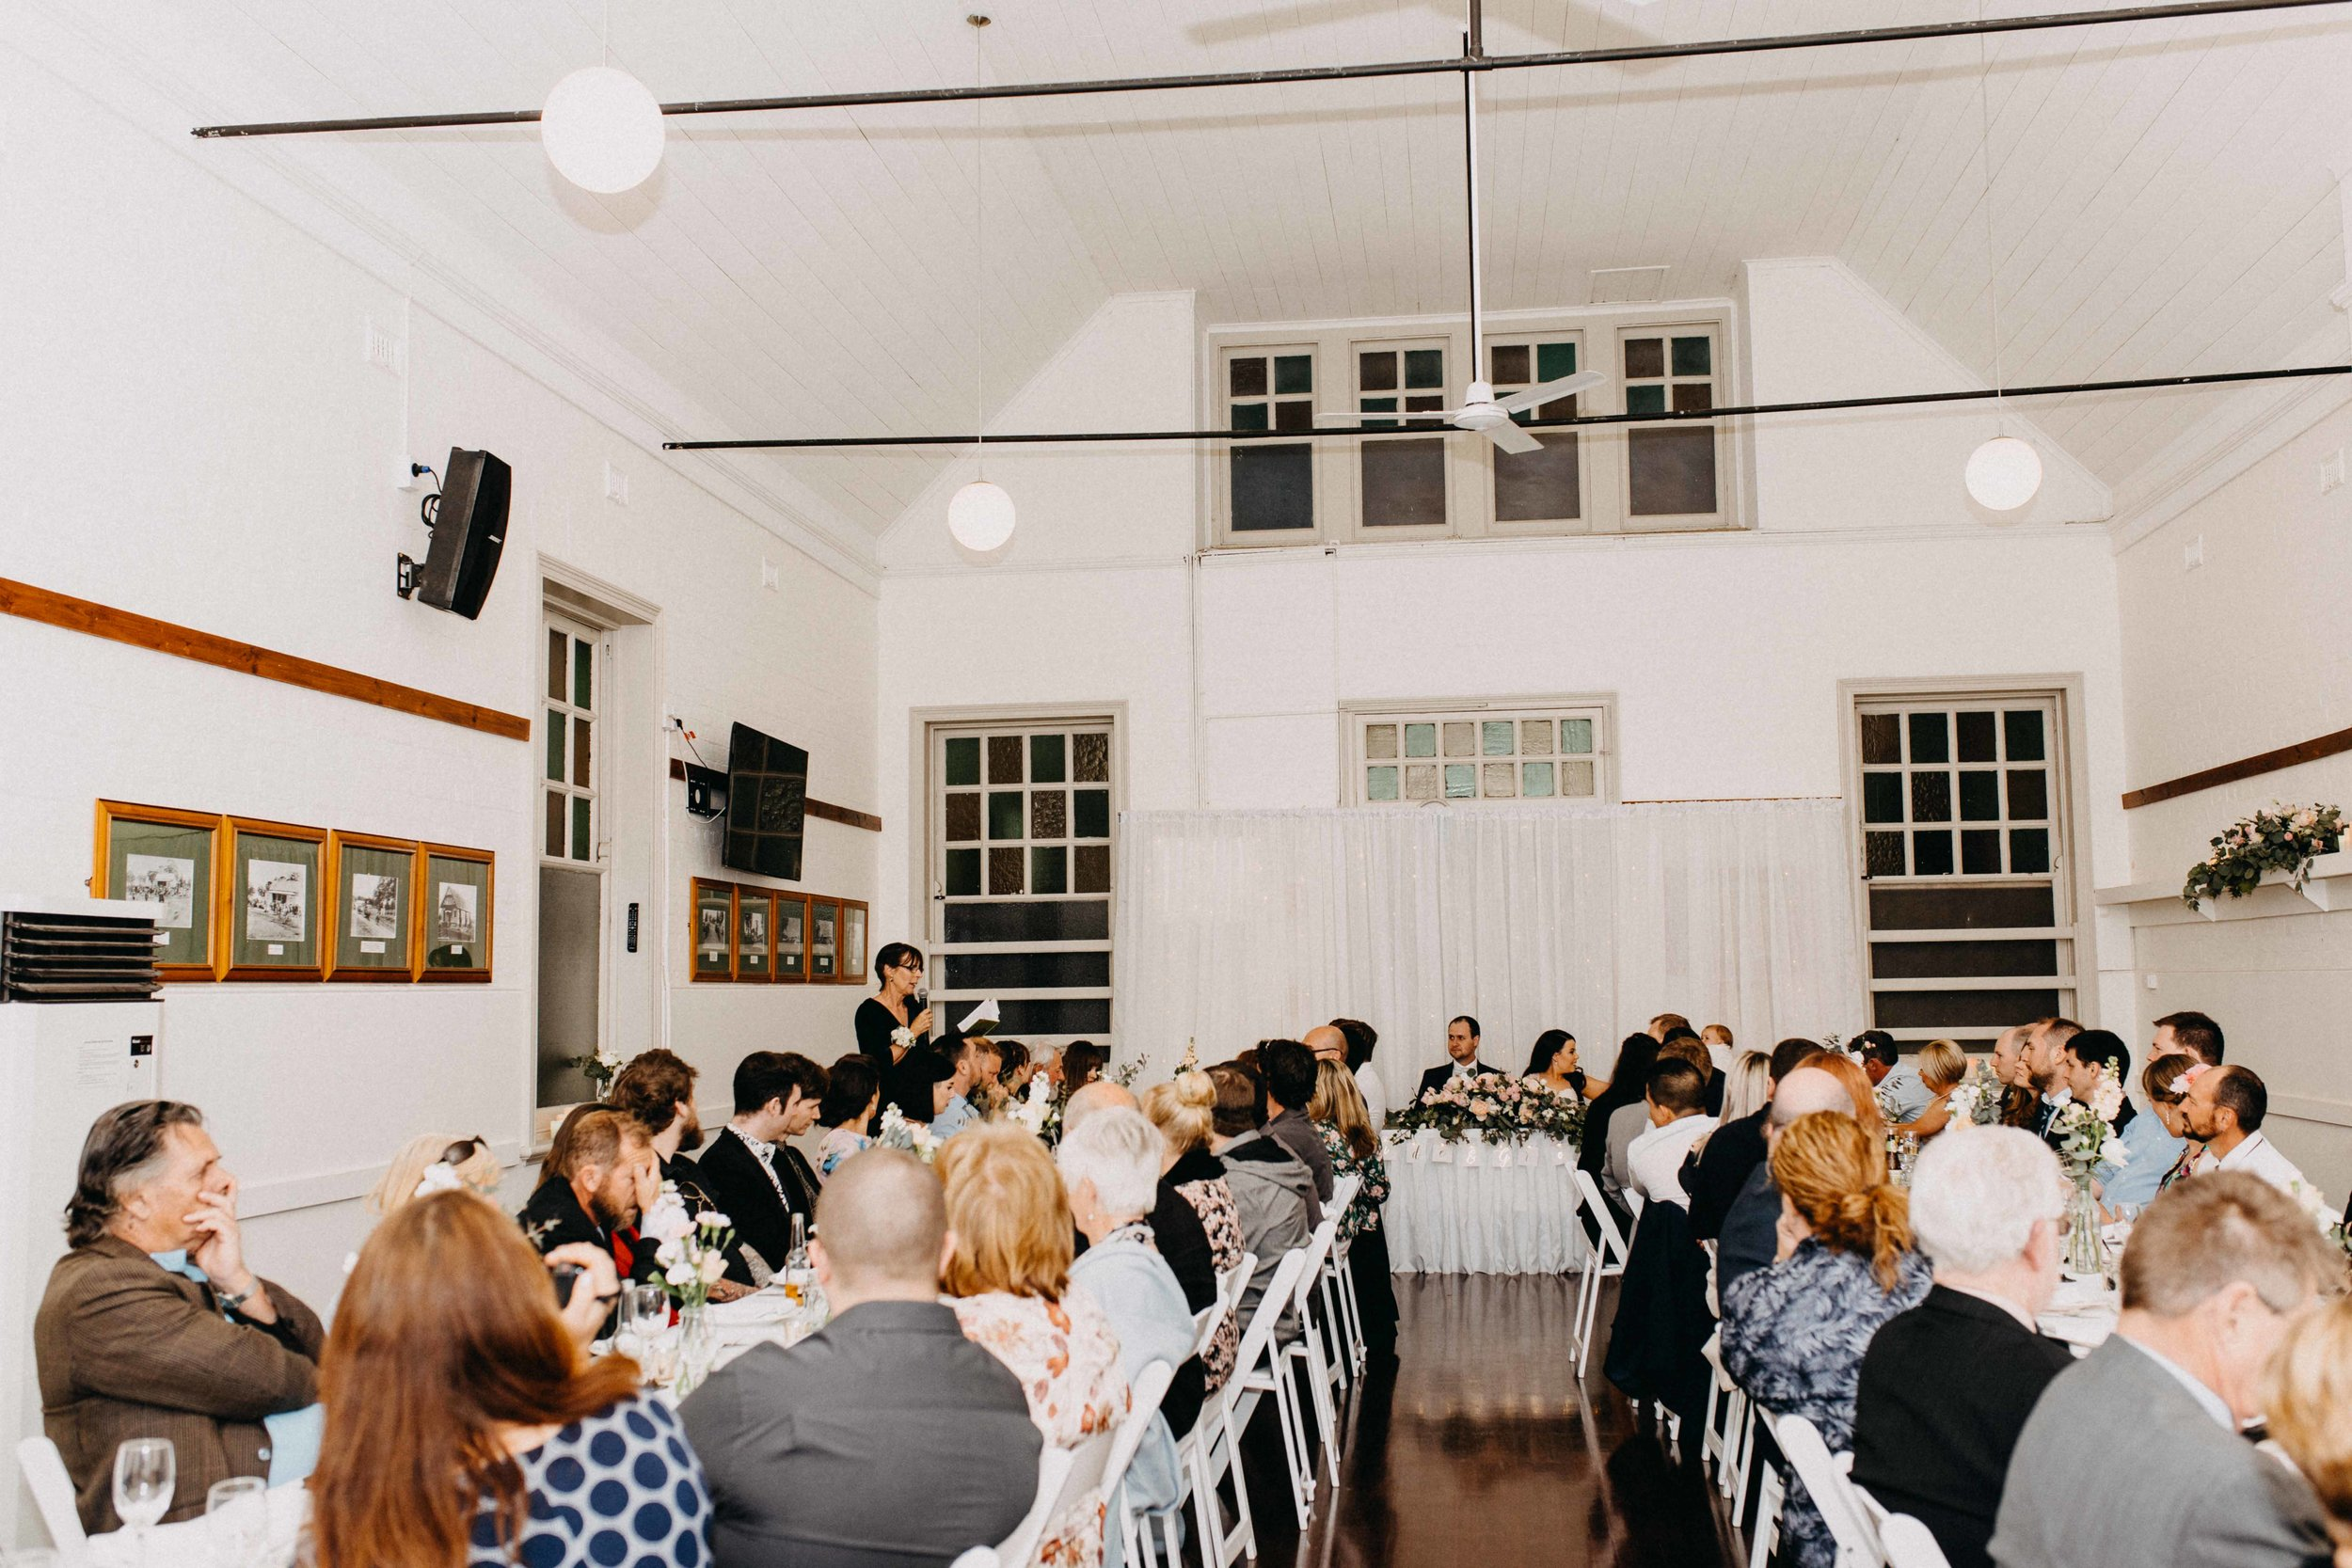 exeter-southern-highlands-wedding-www.emilyobrienphotography.net -137.jpg